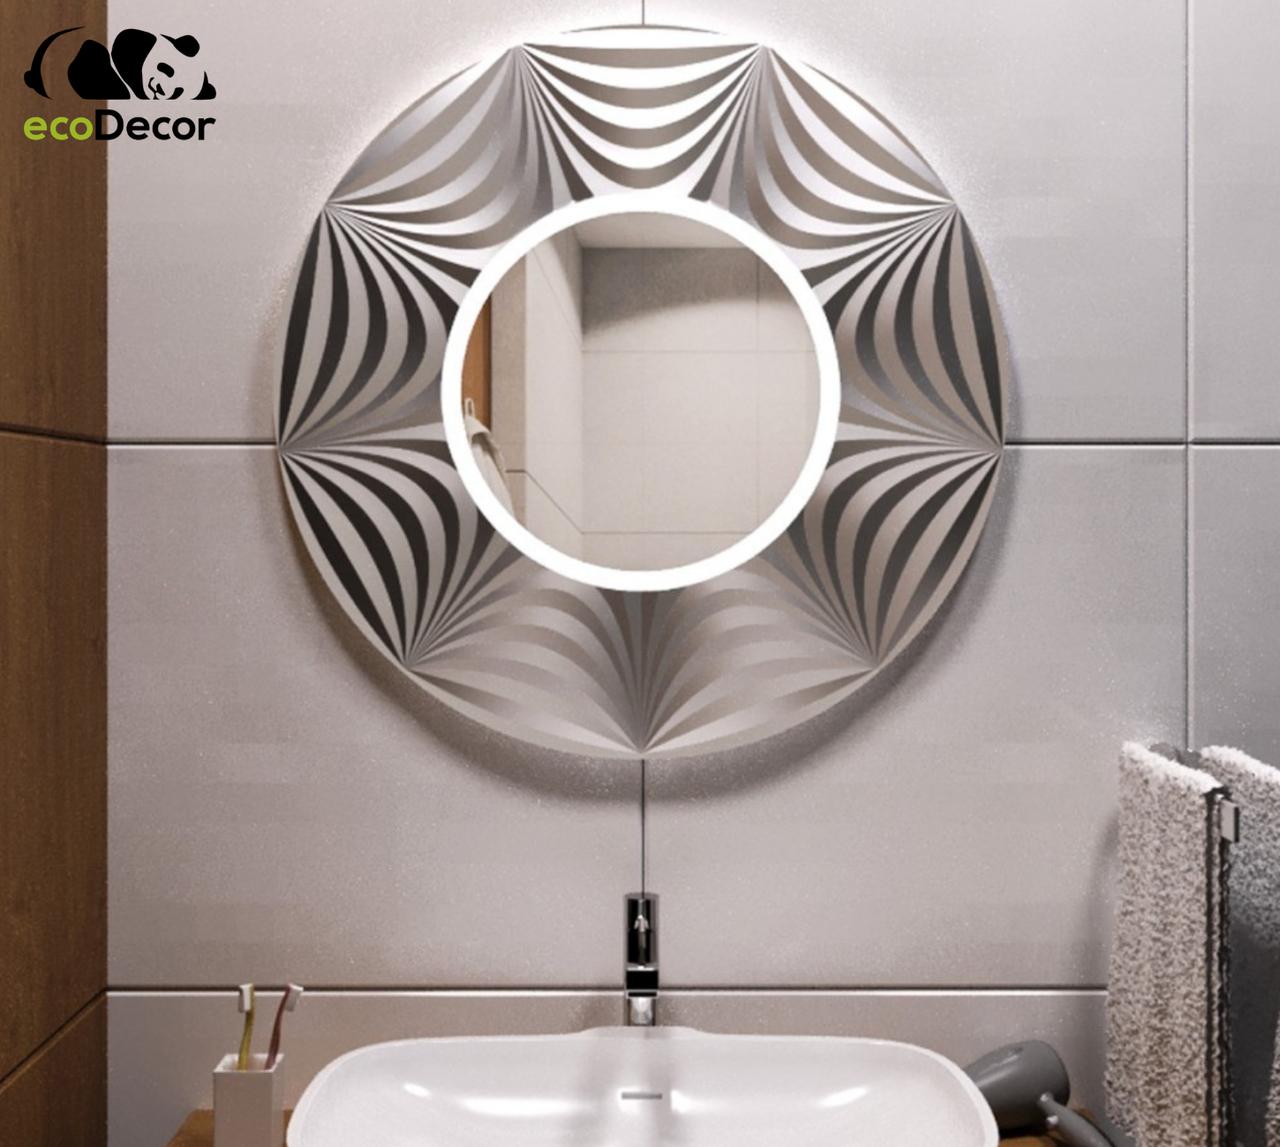 Зеркало круглое с LED подсветкой в серебряной раме Tallinn